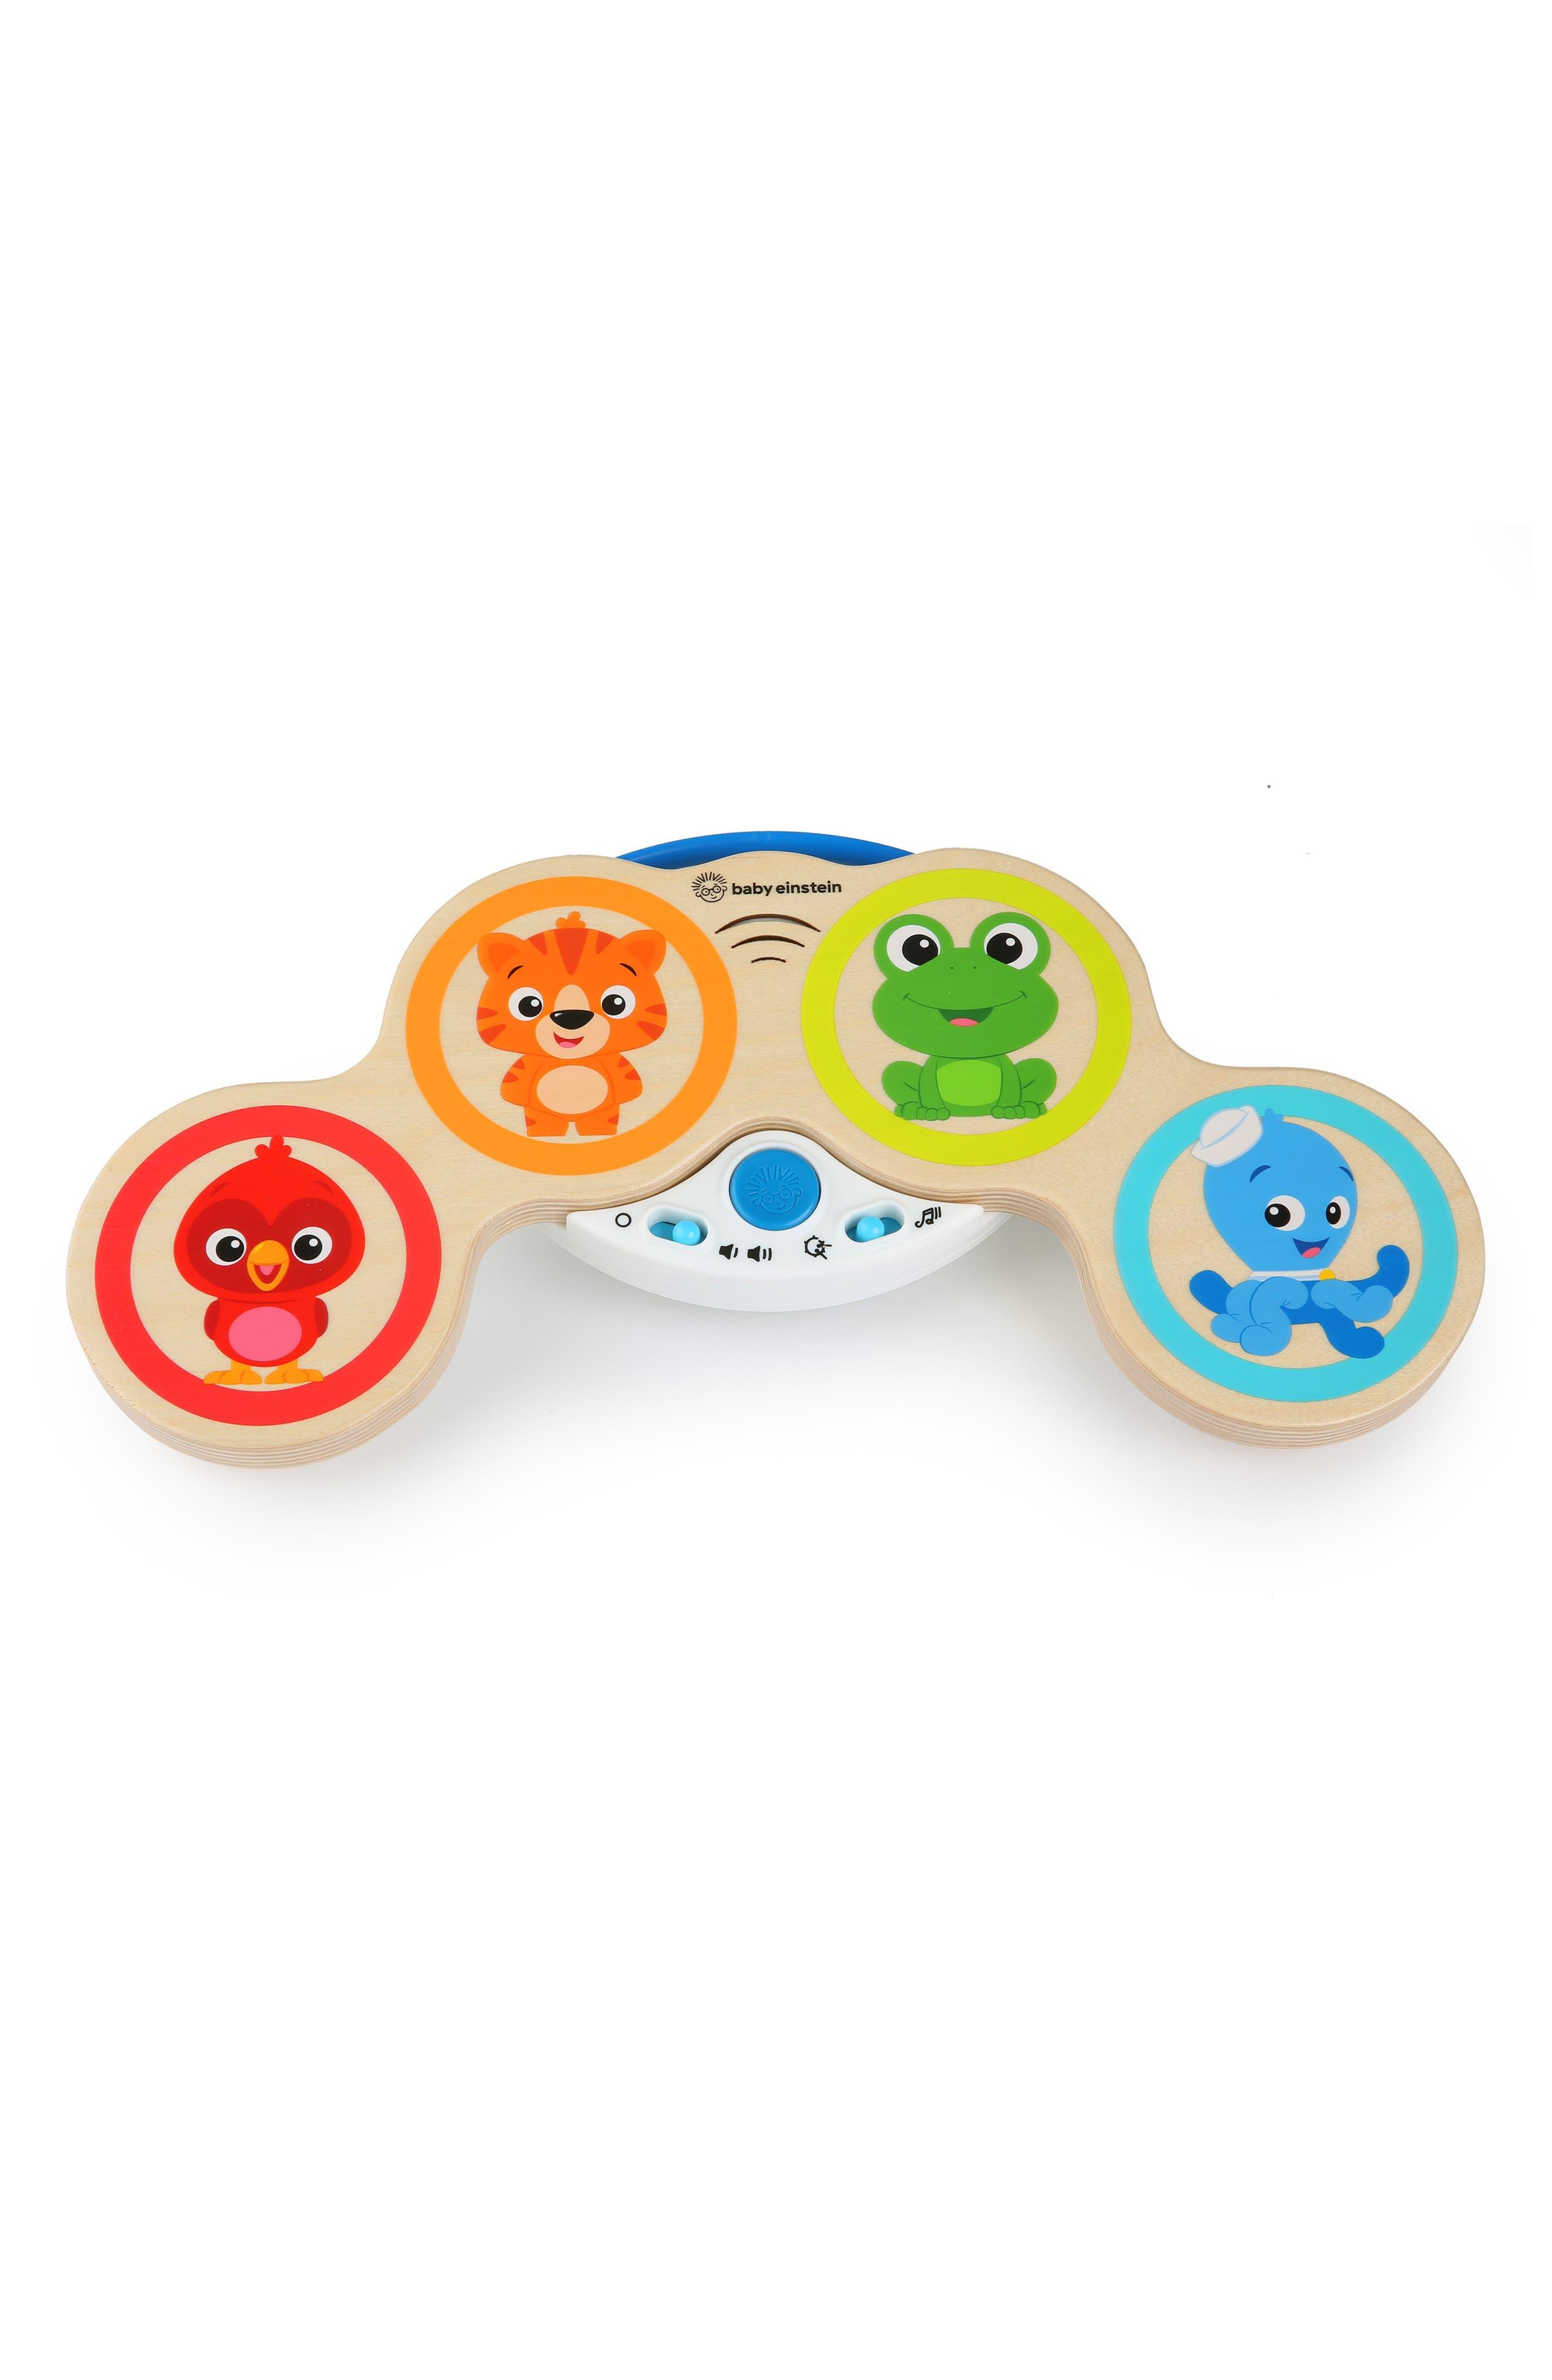 Infant Baby Einstein Hape Magic Touch Drums(TM) Wooden Musical Toy